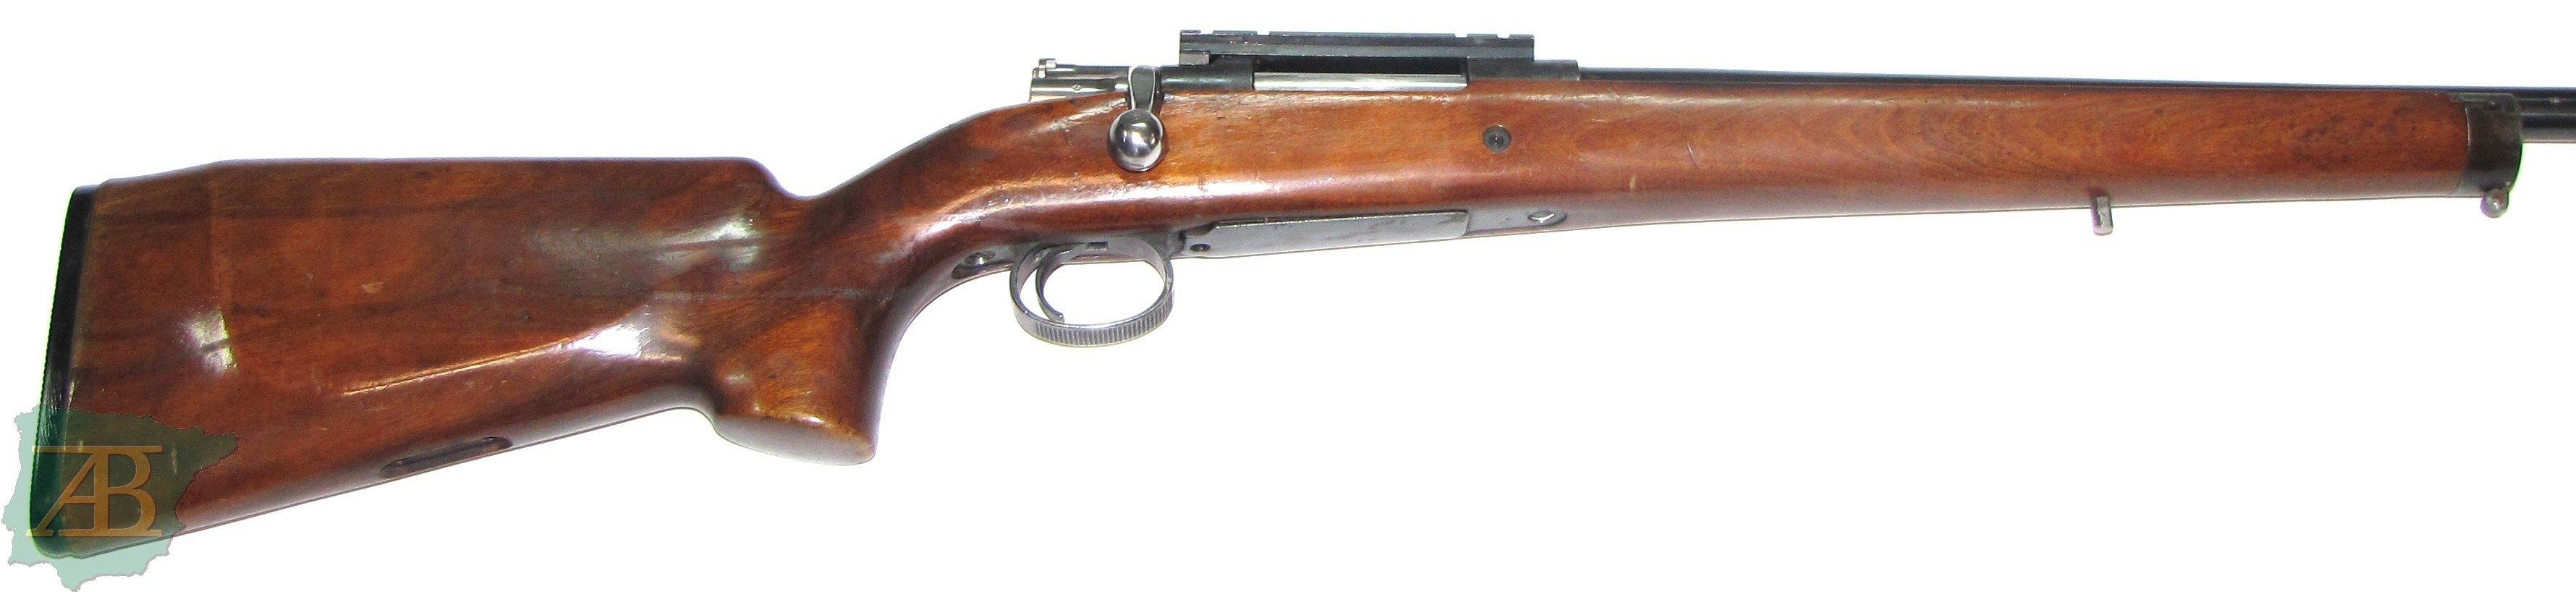 Rifle de cerrojo de caza CARL GUSTAFF CG73 ref REP2019-731-armeriaiberica-2